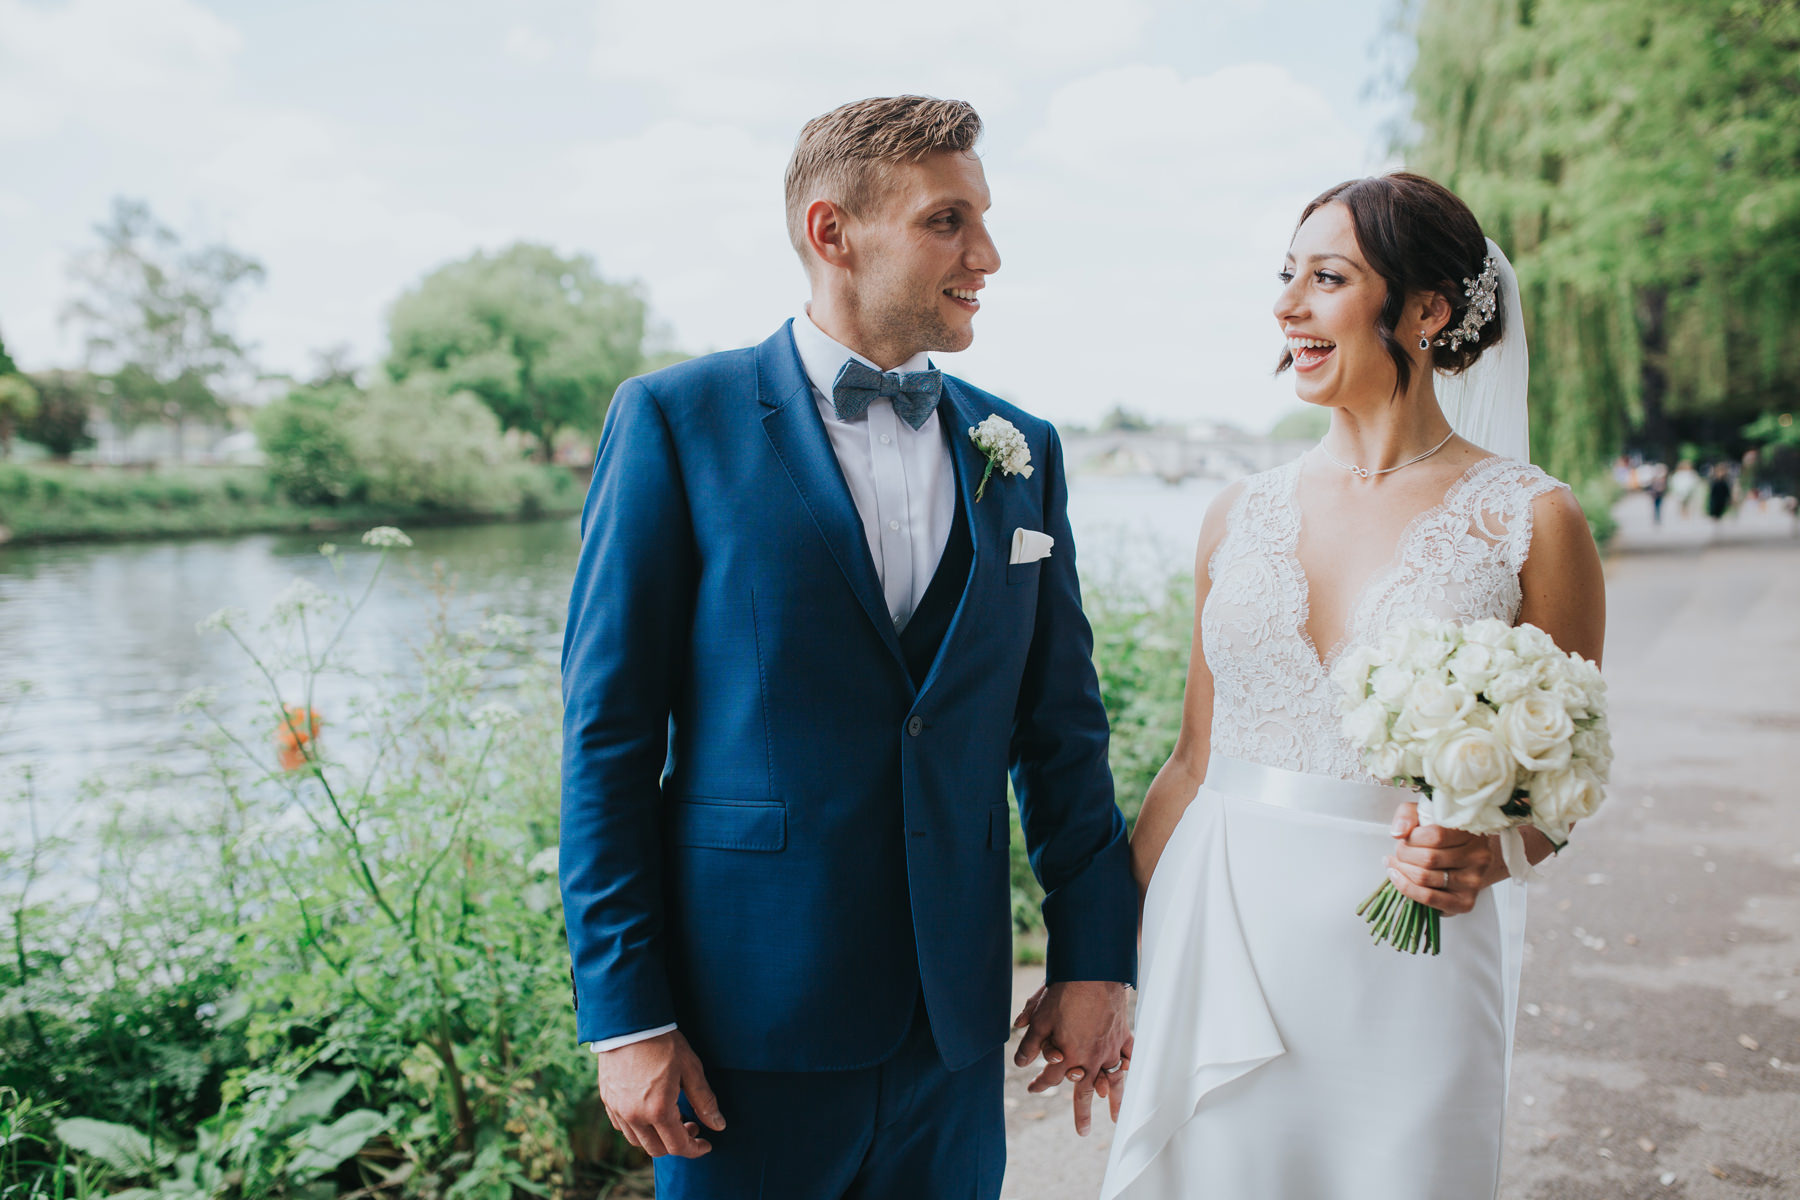 CRL-380-The Bingham wedding Richmond-Claire Rob bridal couple portraits on Thamespath.jpg